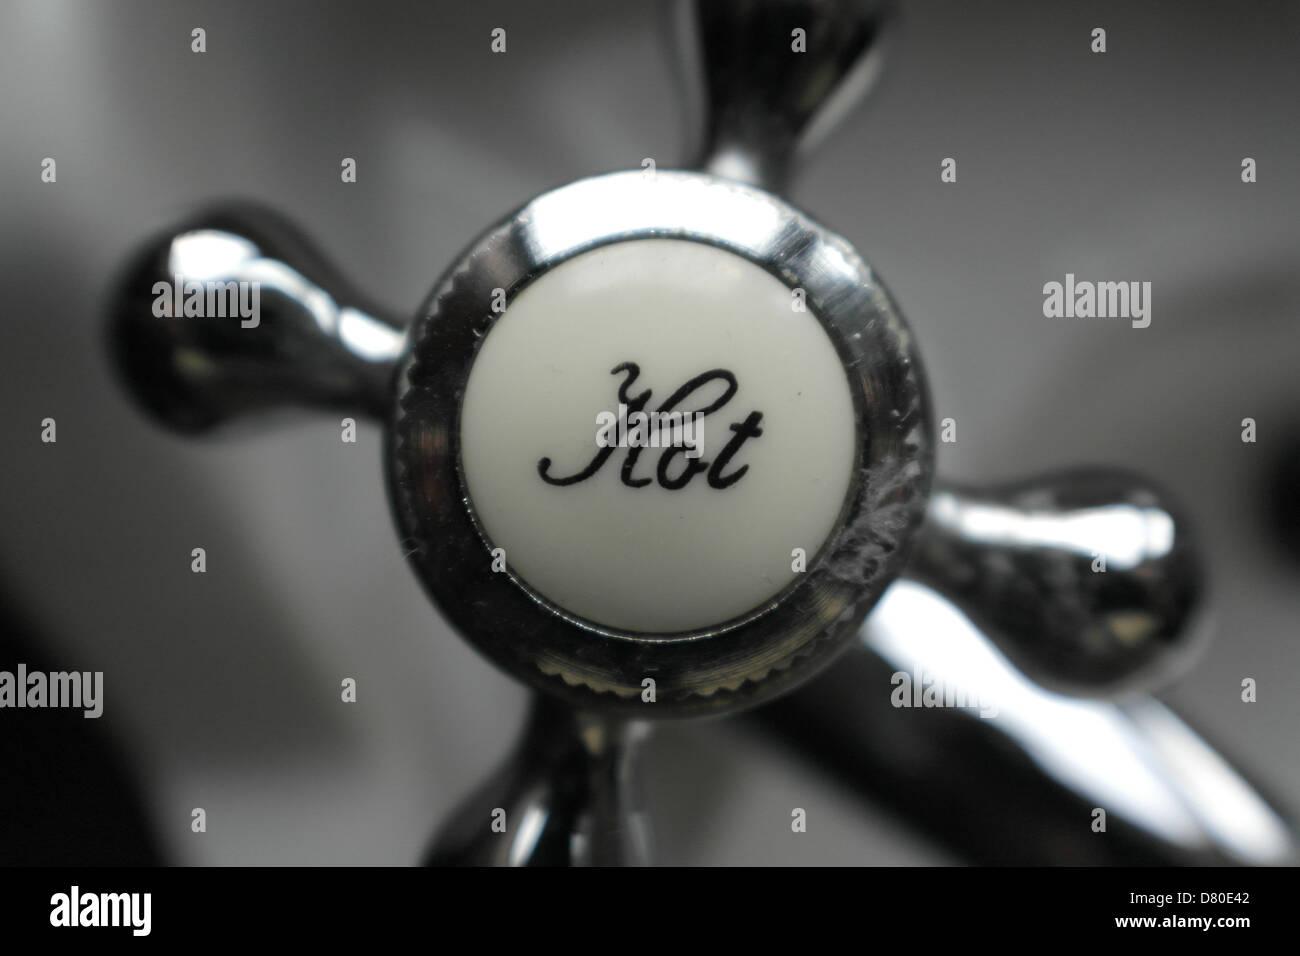 Hot tap - Stock Image